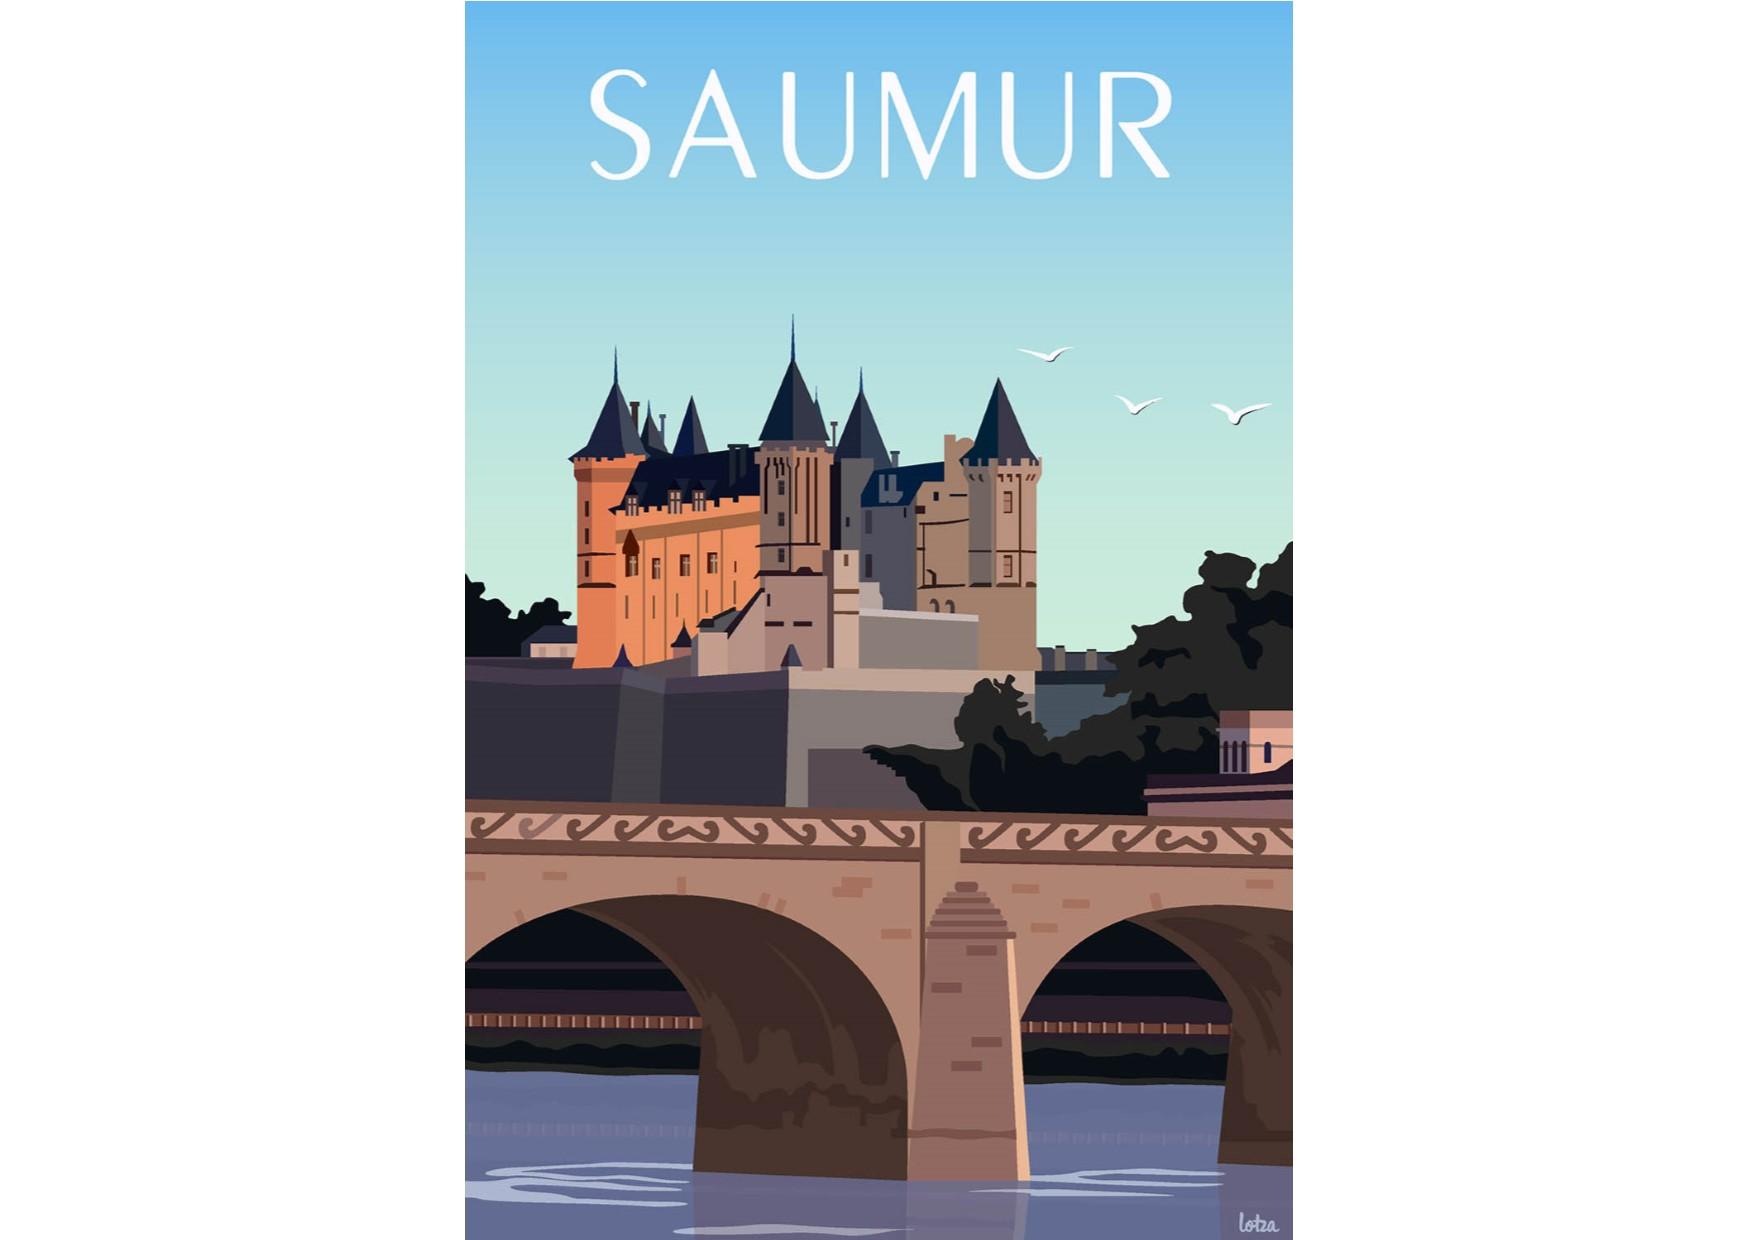 Affiche Saumur - Lotza